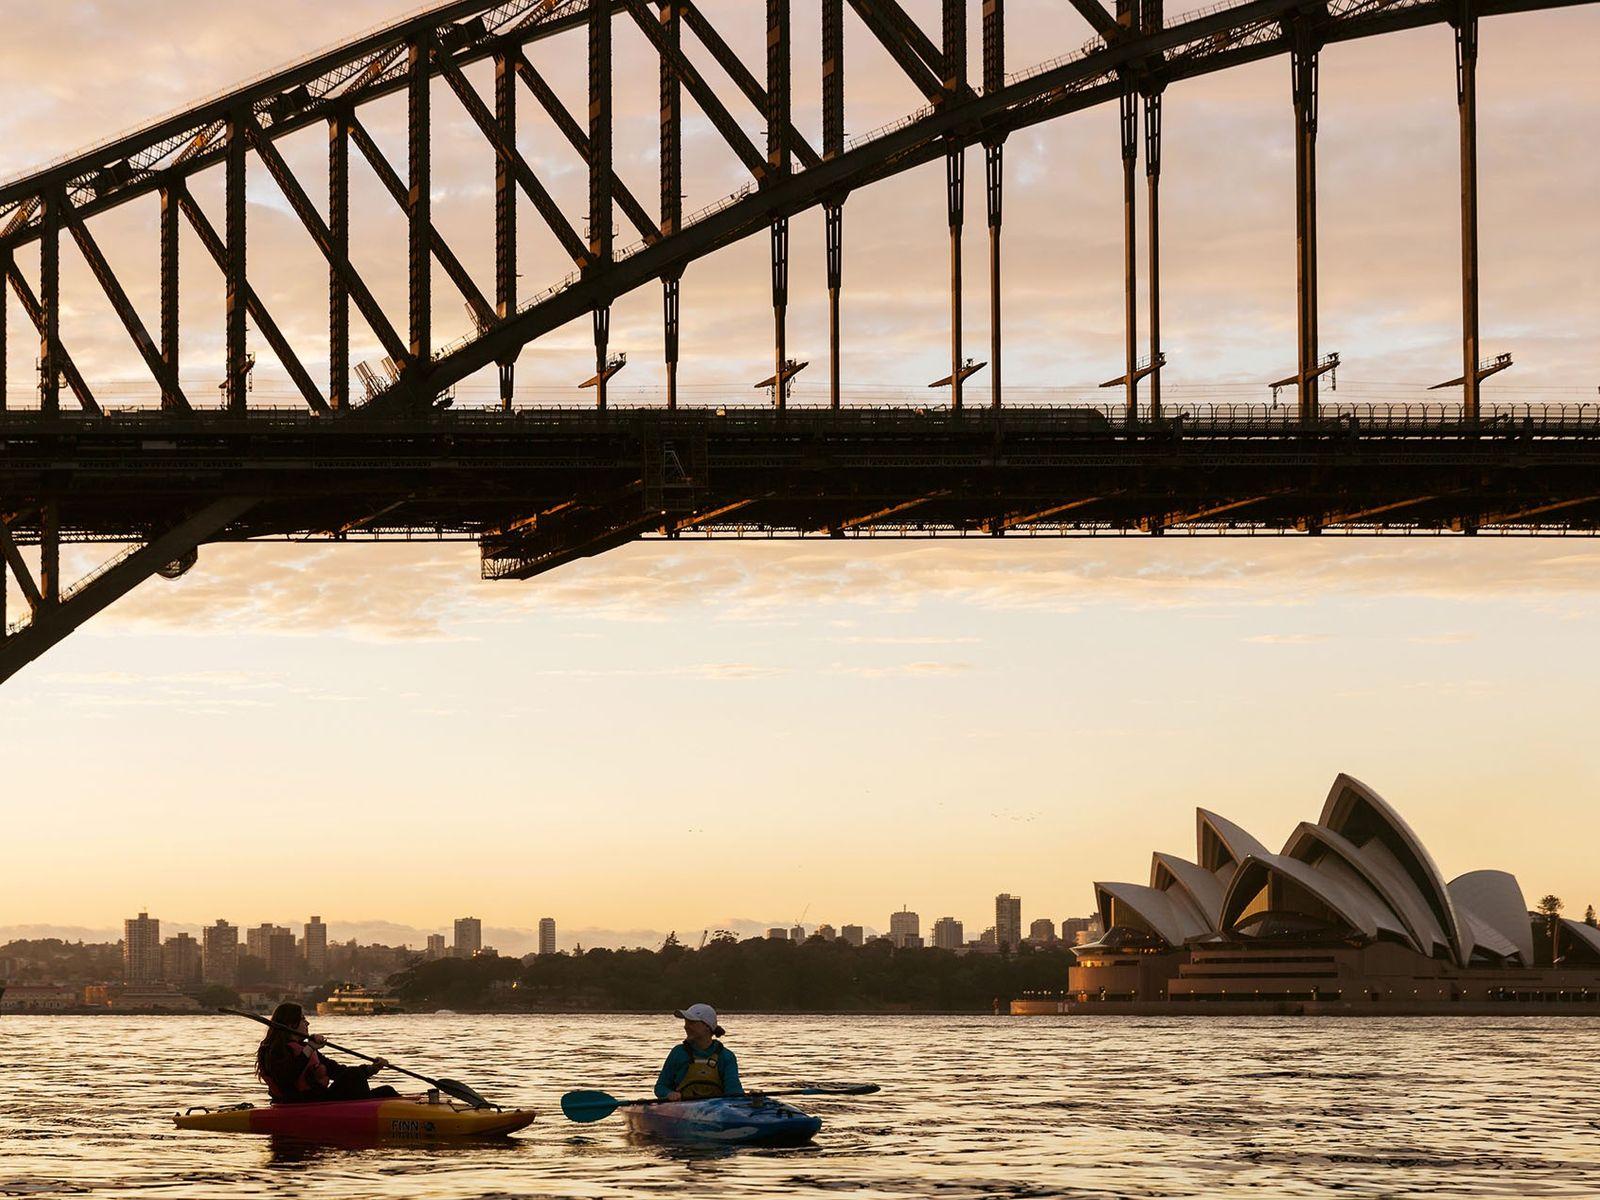 Kayakers under the Sydney Harbour Bridge at sunrise